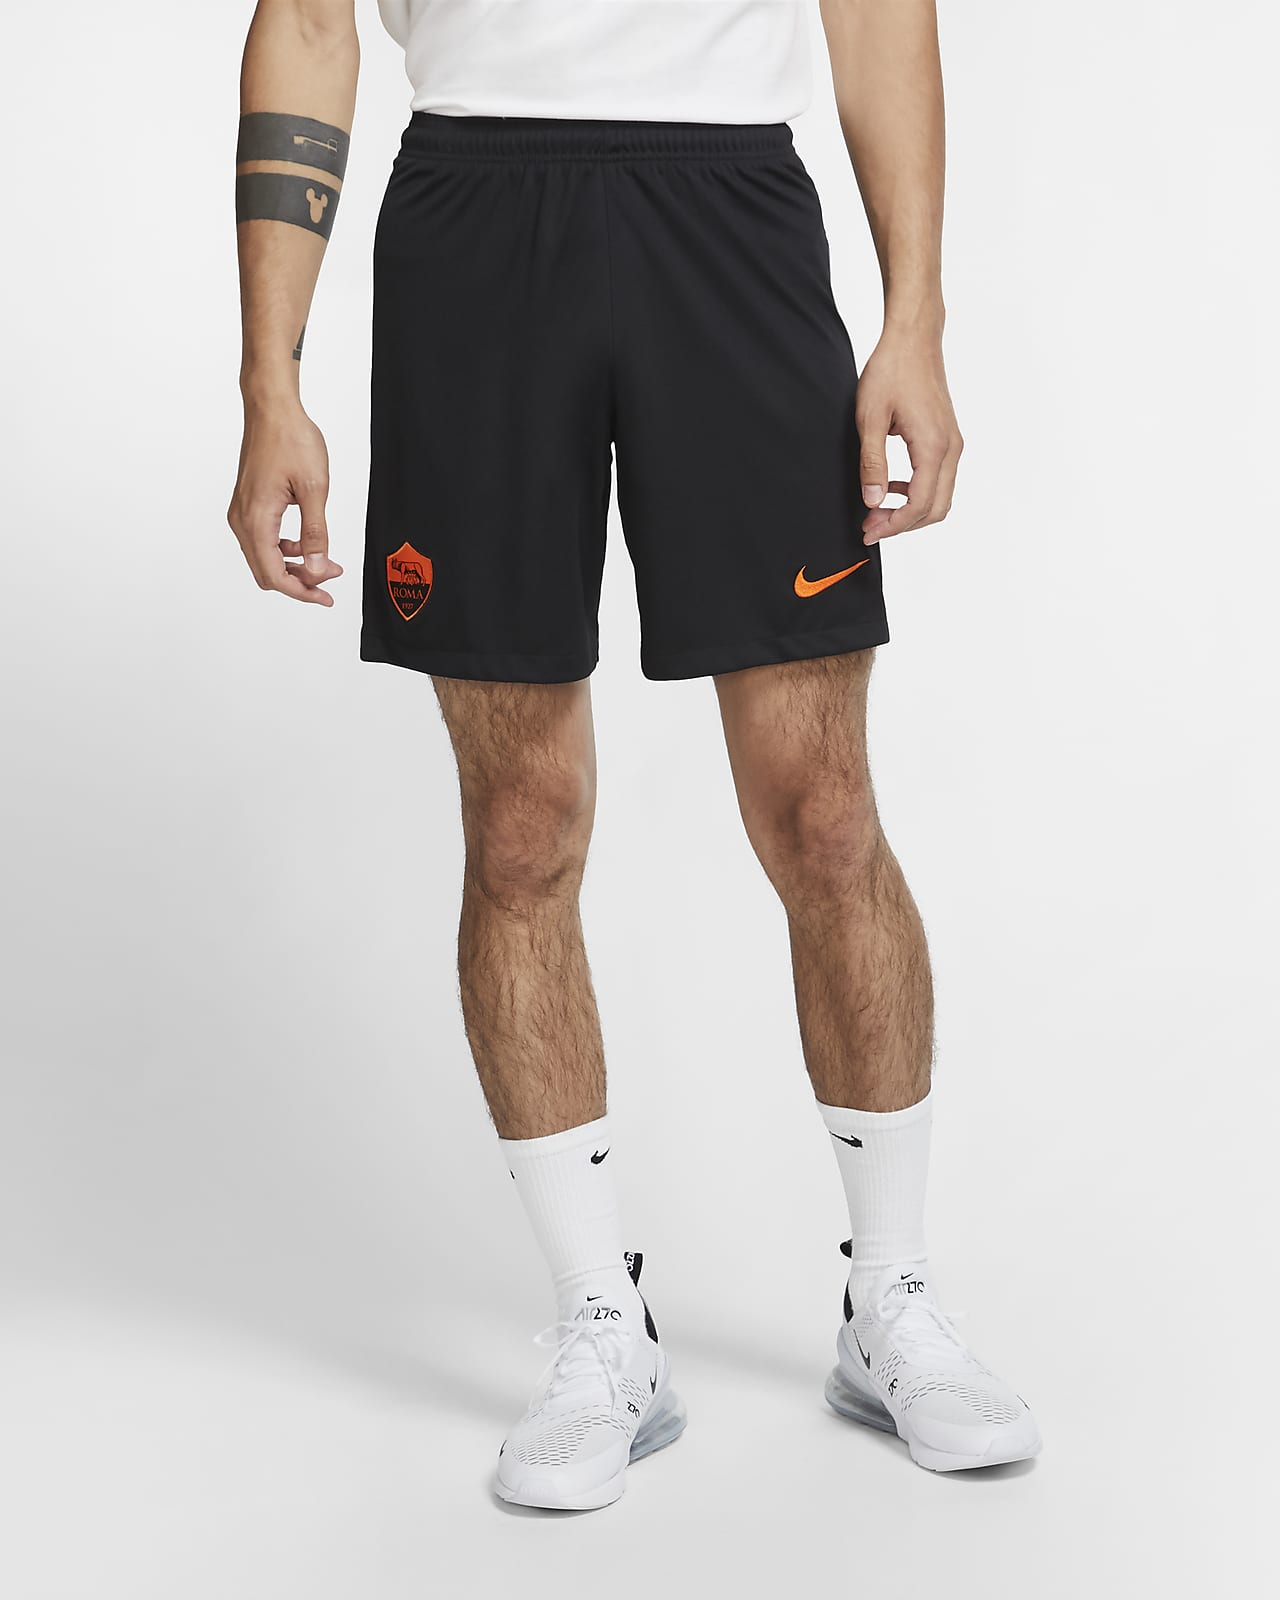 AS Roma 2020/21 Stadium Third Men's Football Shorts